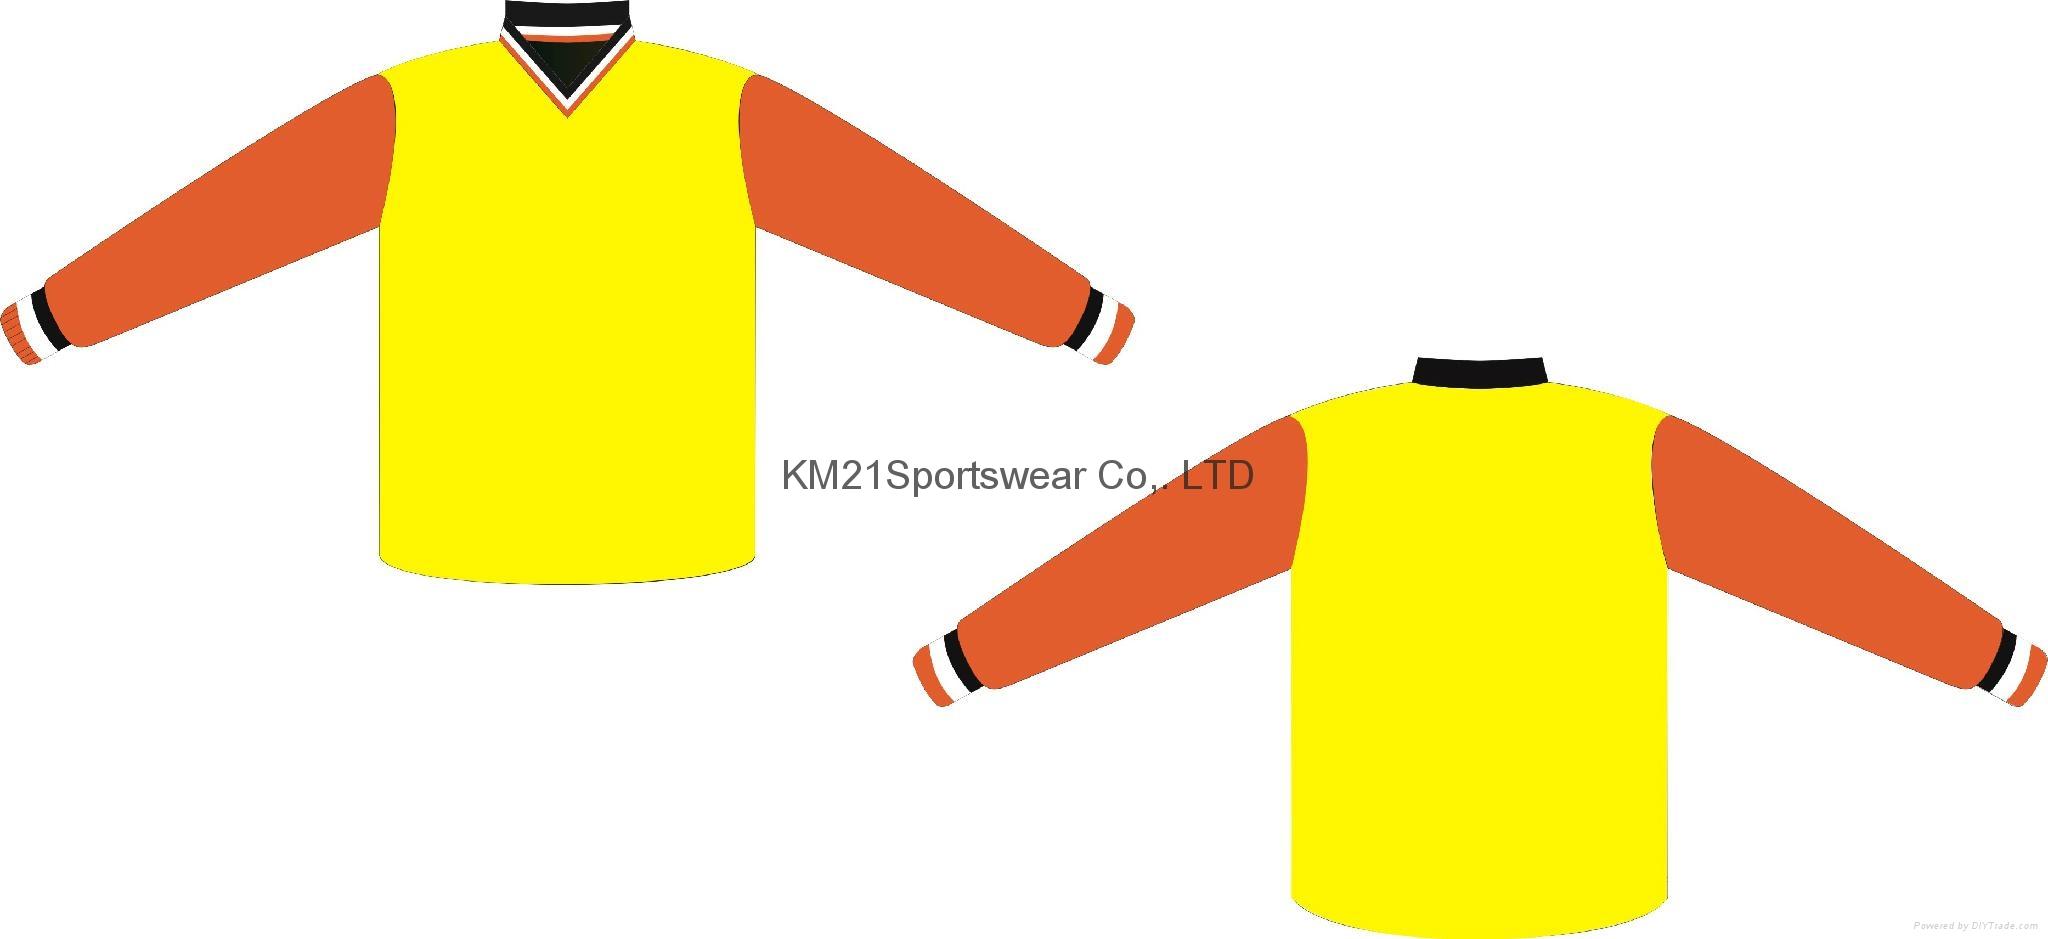 autocross jersey Hot Men Custom Training Running Wear With Sublimation 1